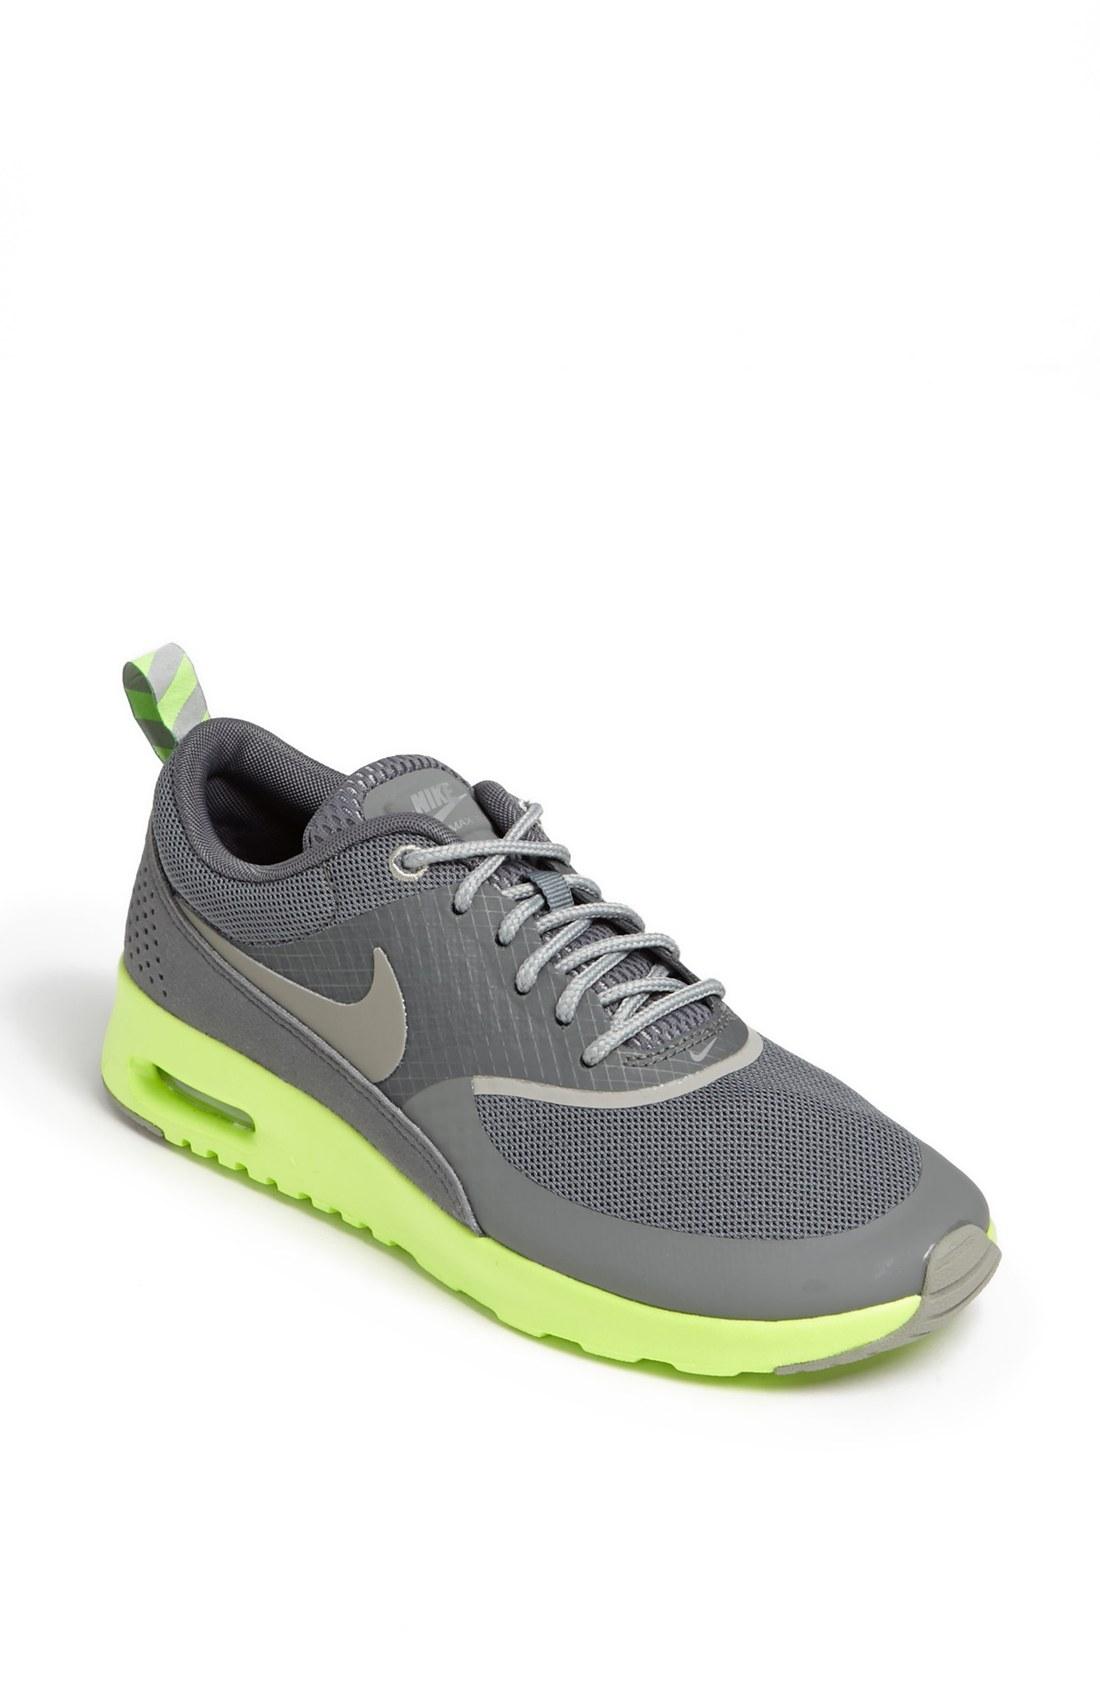 Nike Air Max Thea Lime 20ae4e223